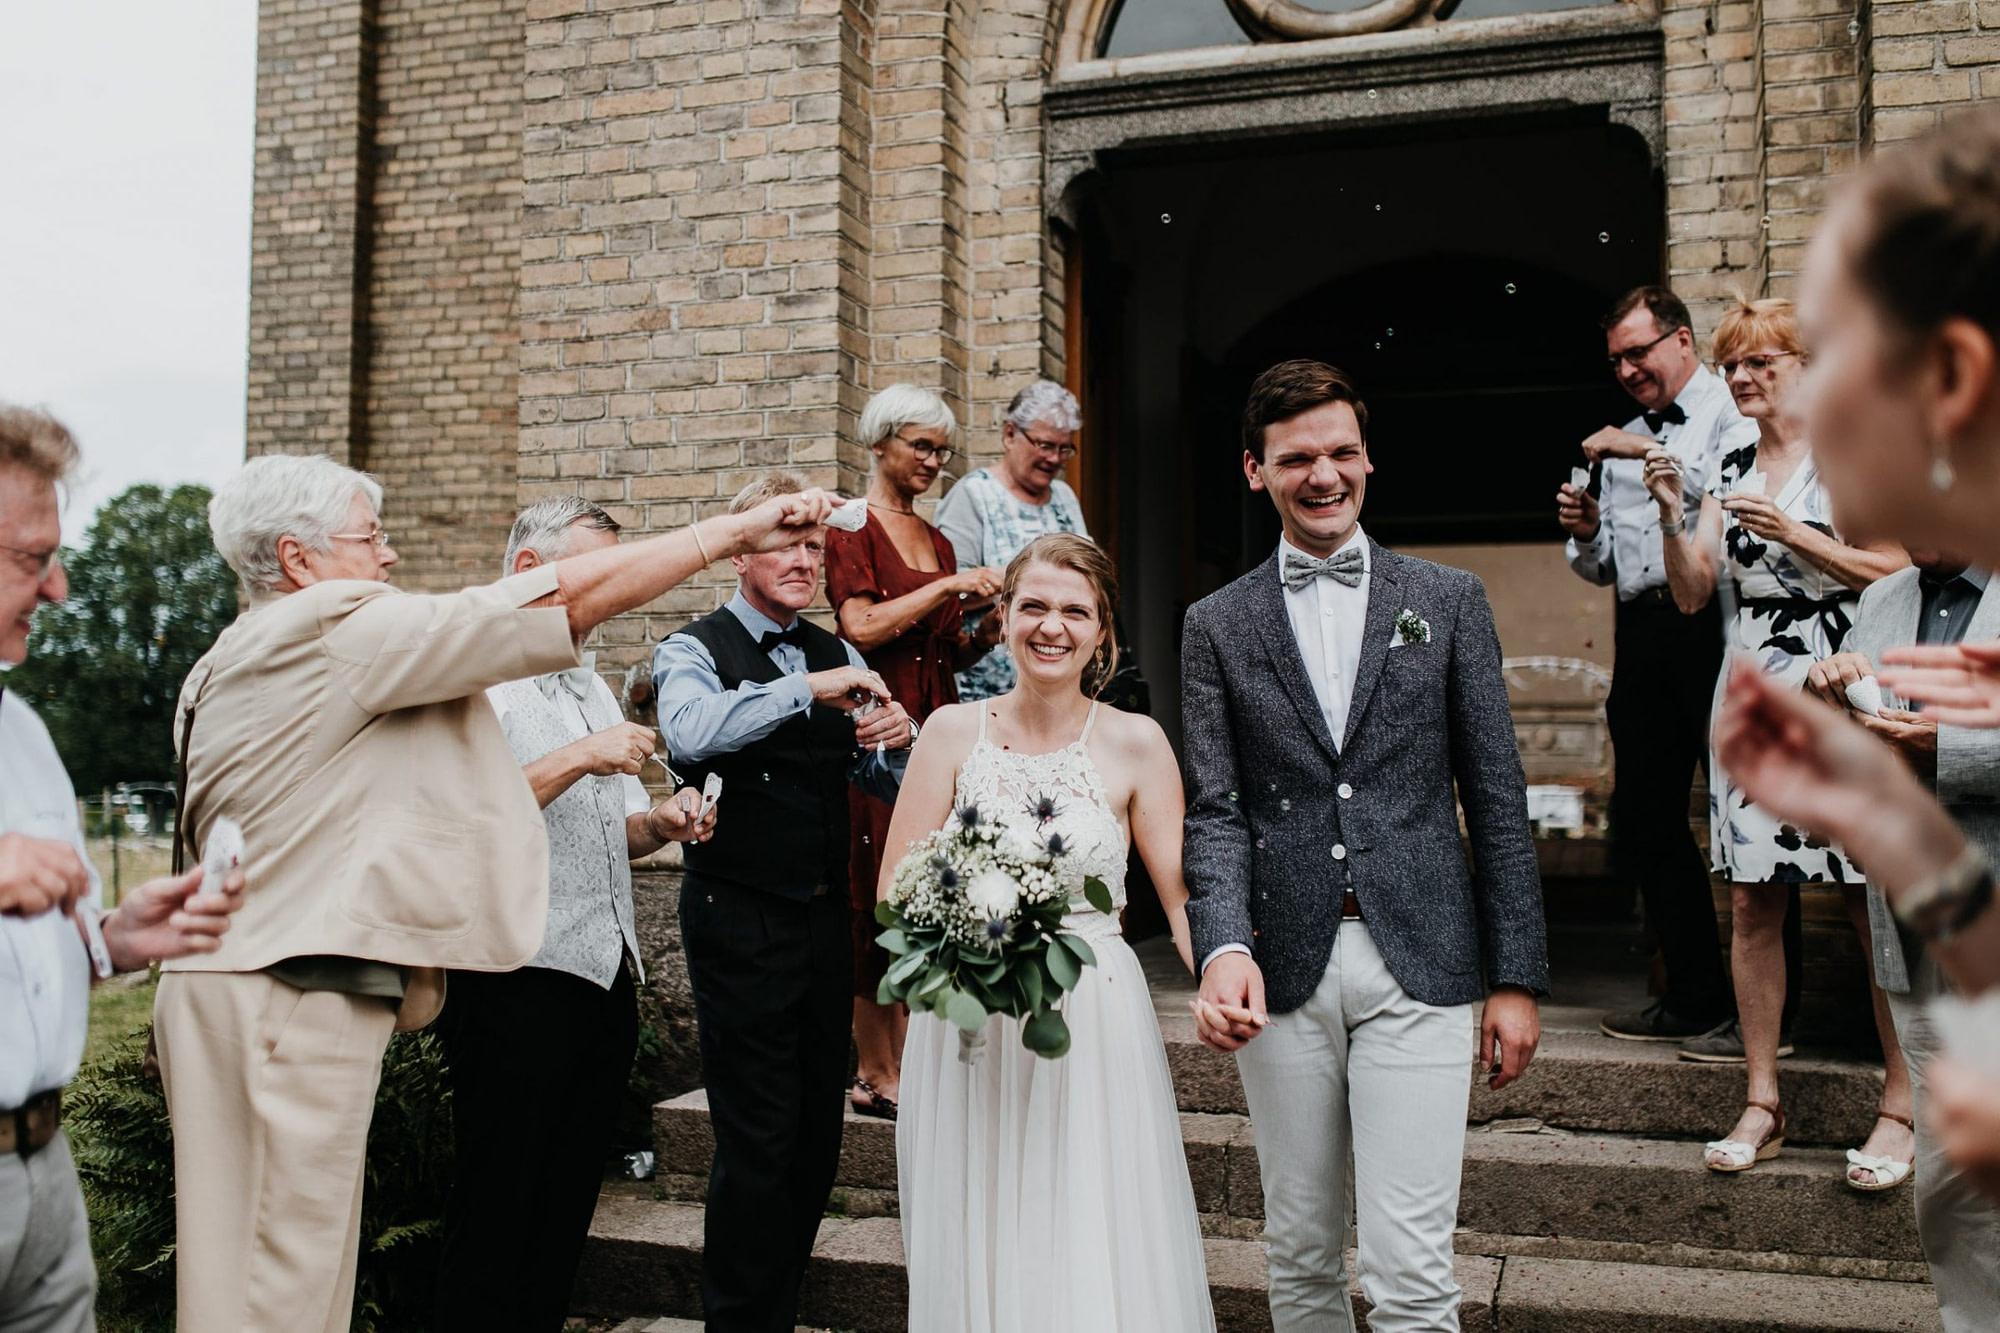 wedding guests, laughter, laughing, hochzeitsgäste, church, freie trauung